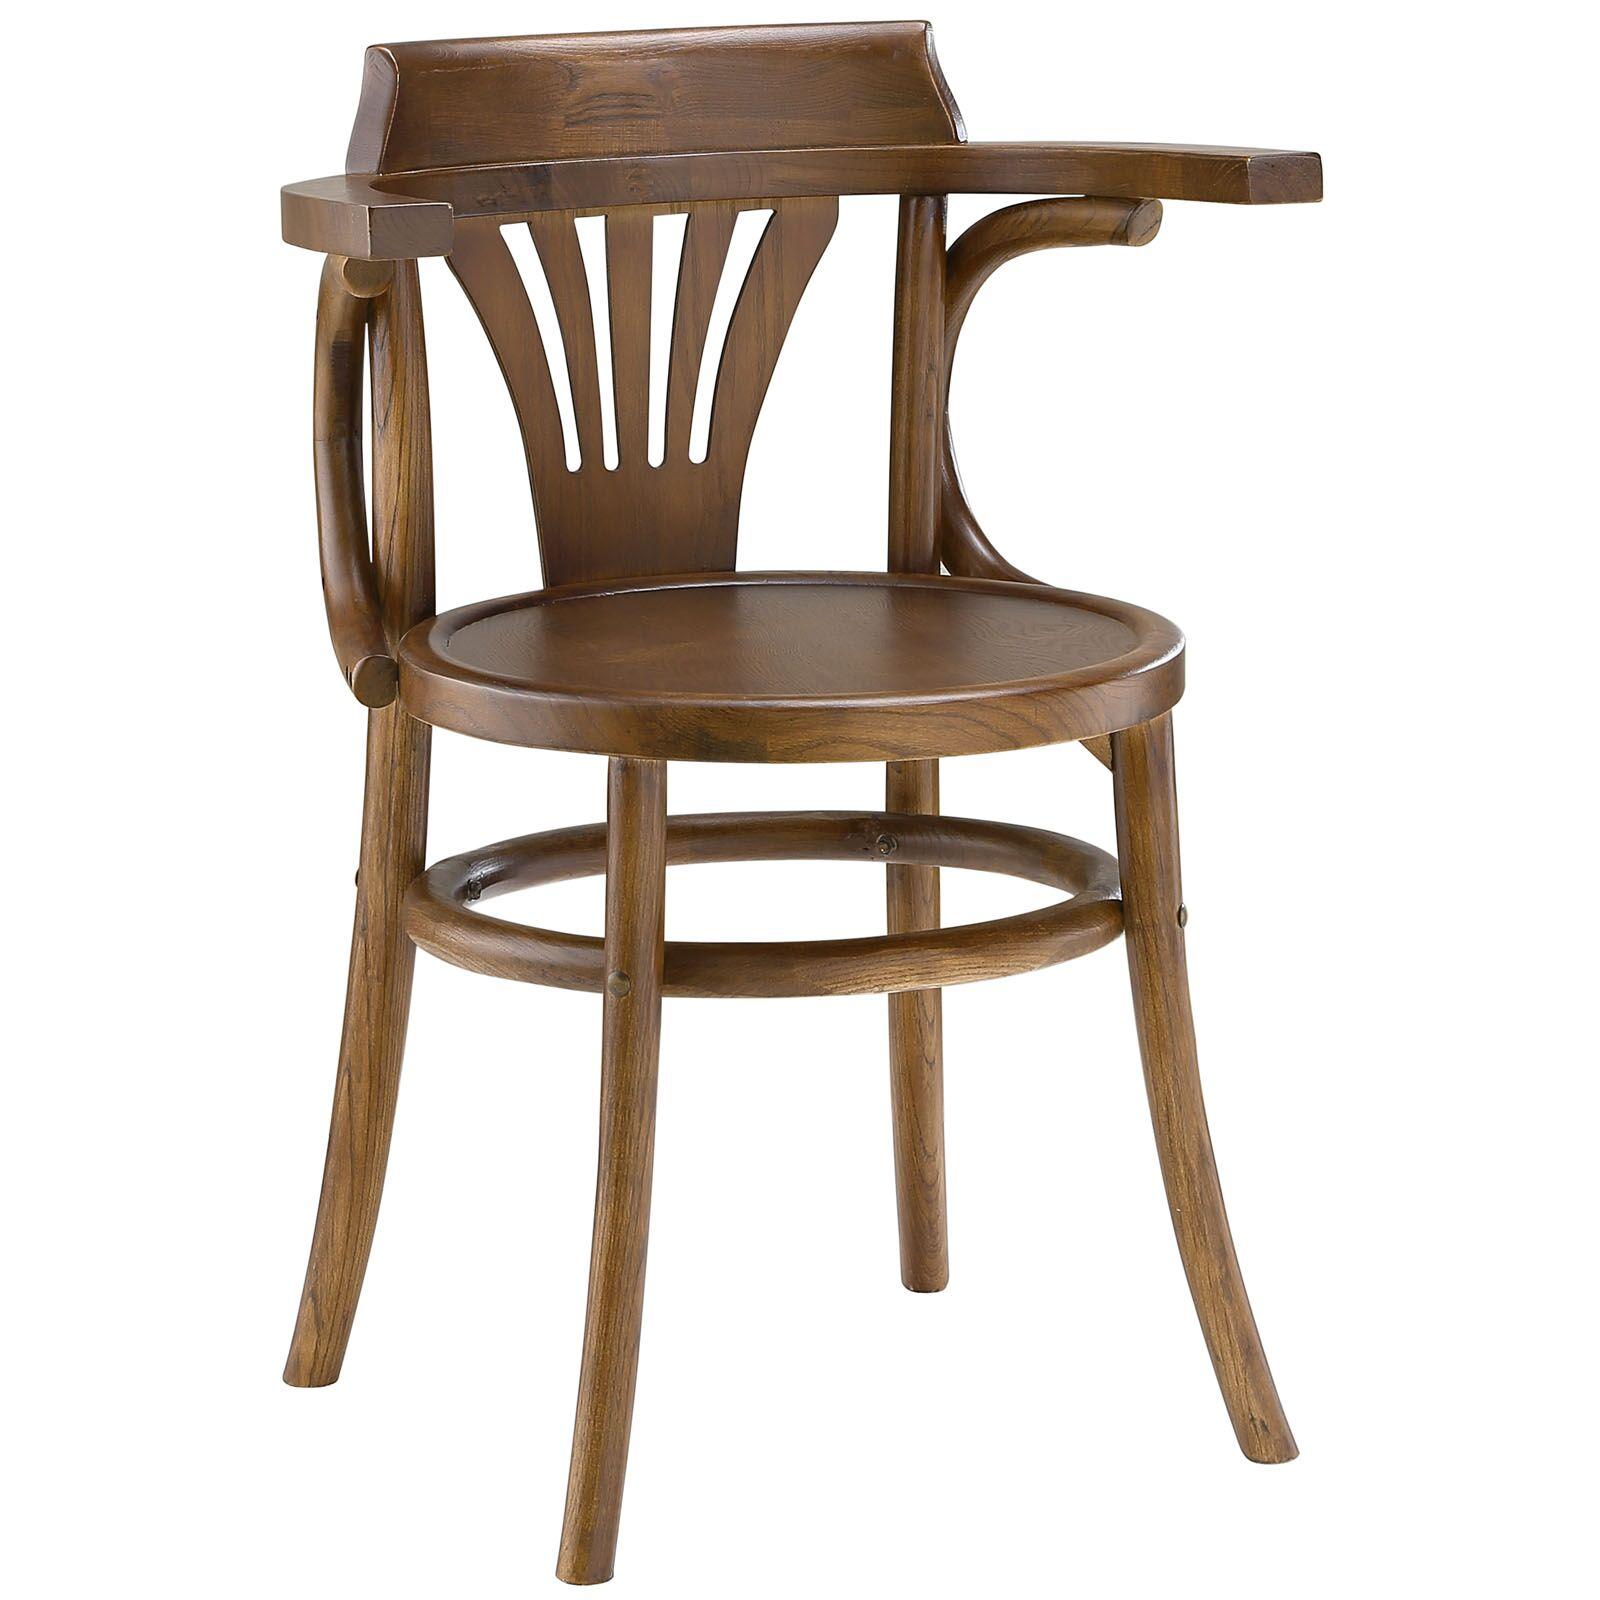 Stretch Solid Wood Dining Chair Finish: Walnut